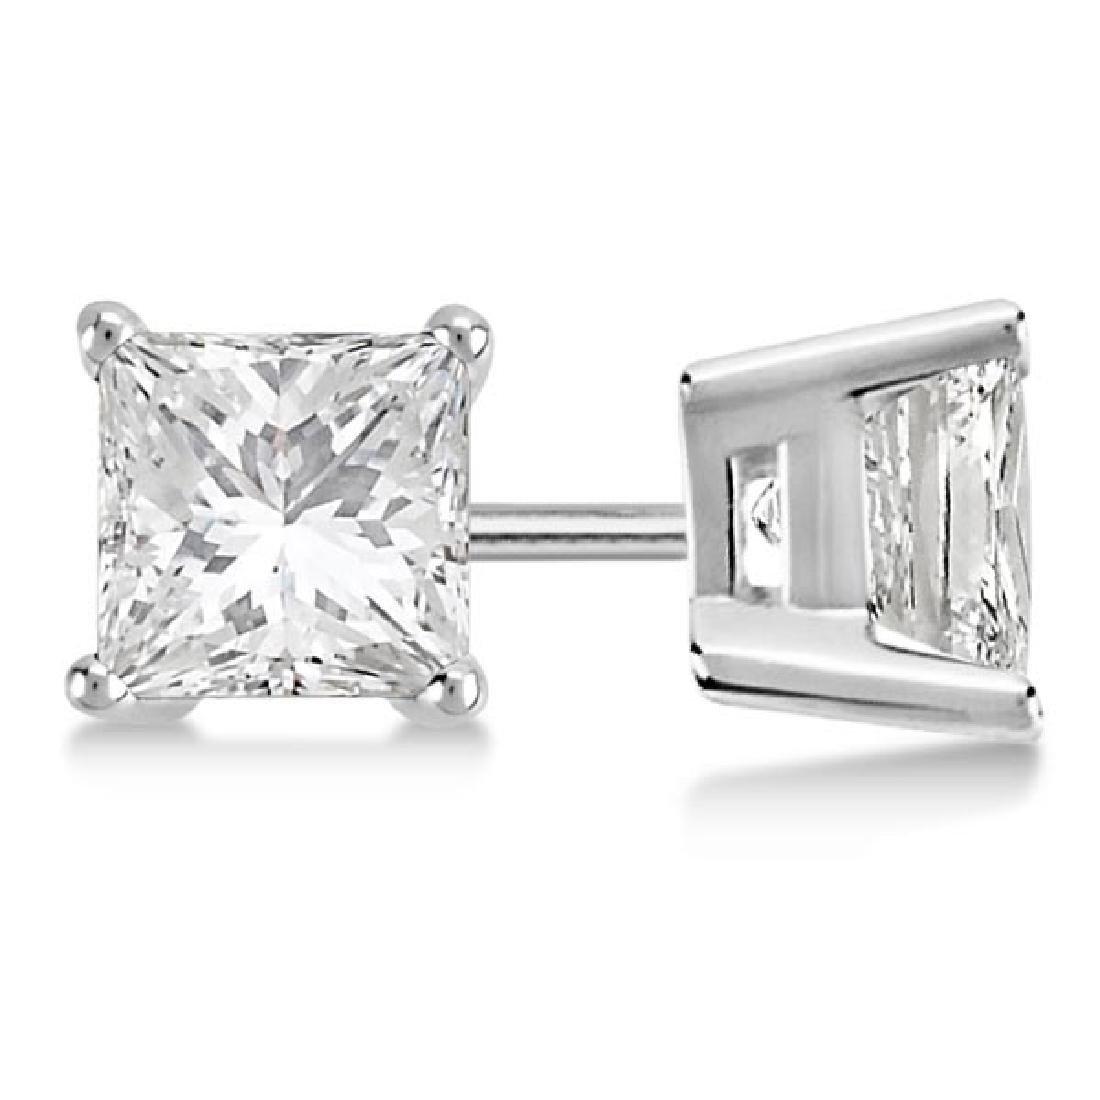 Certified 1.08 CTW Princess Diamond Stud Earrings F/SI2